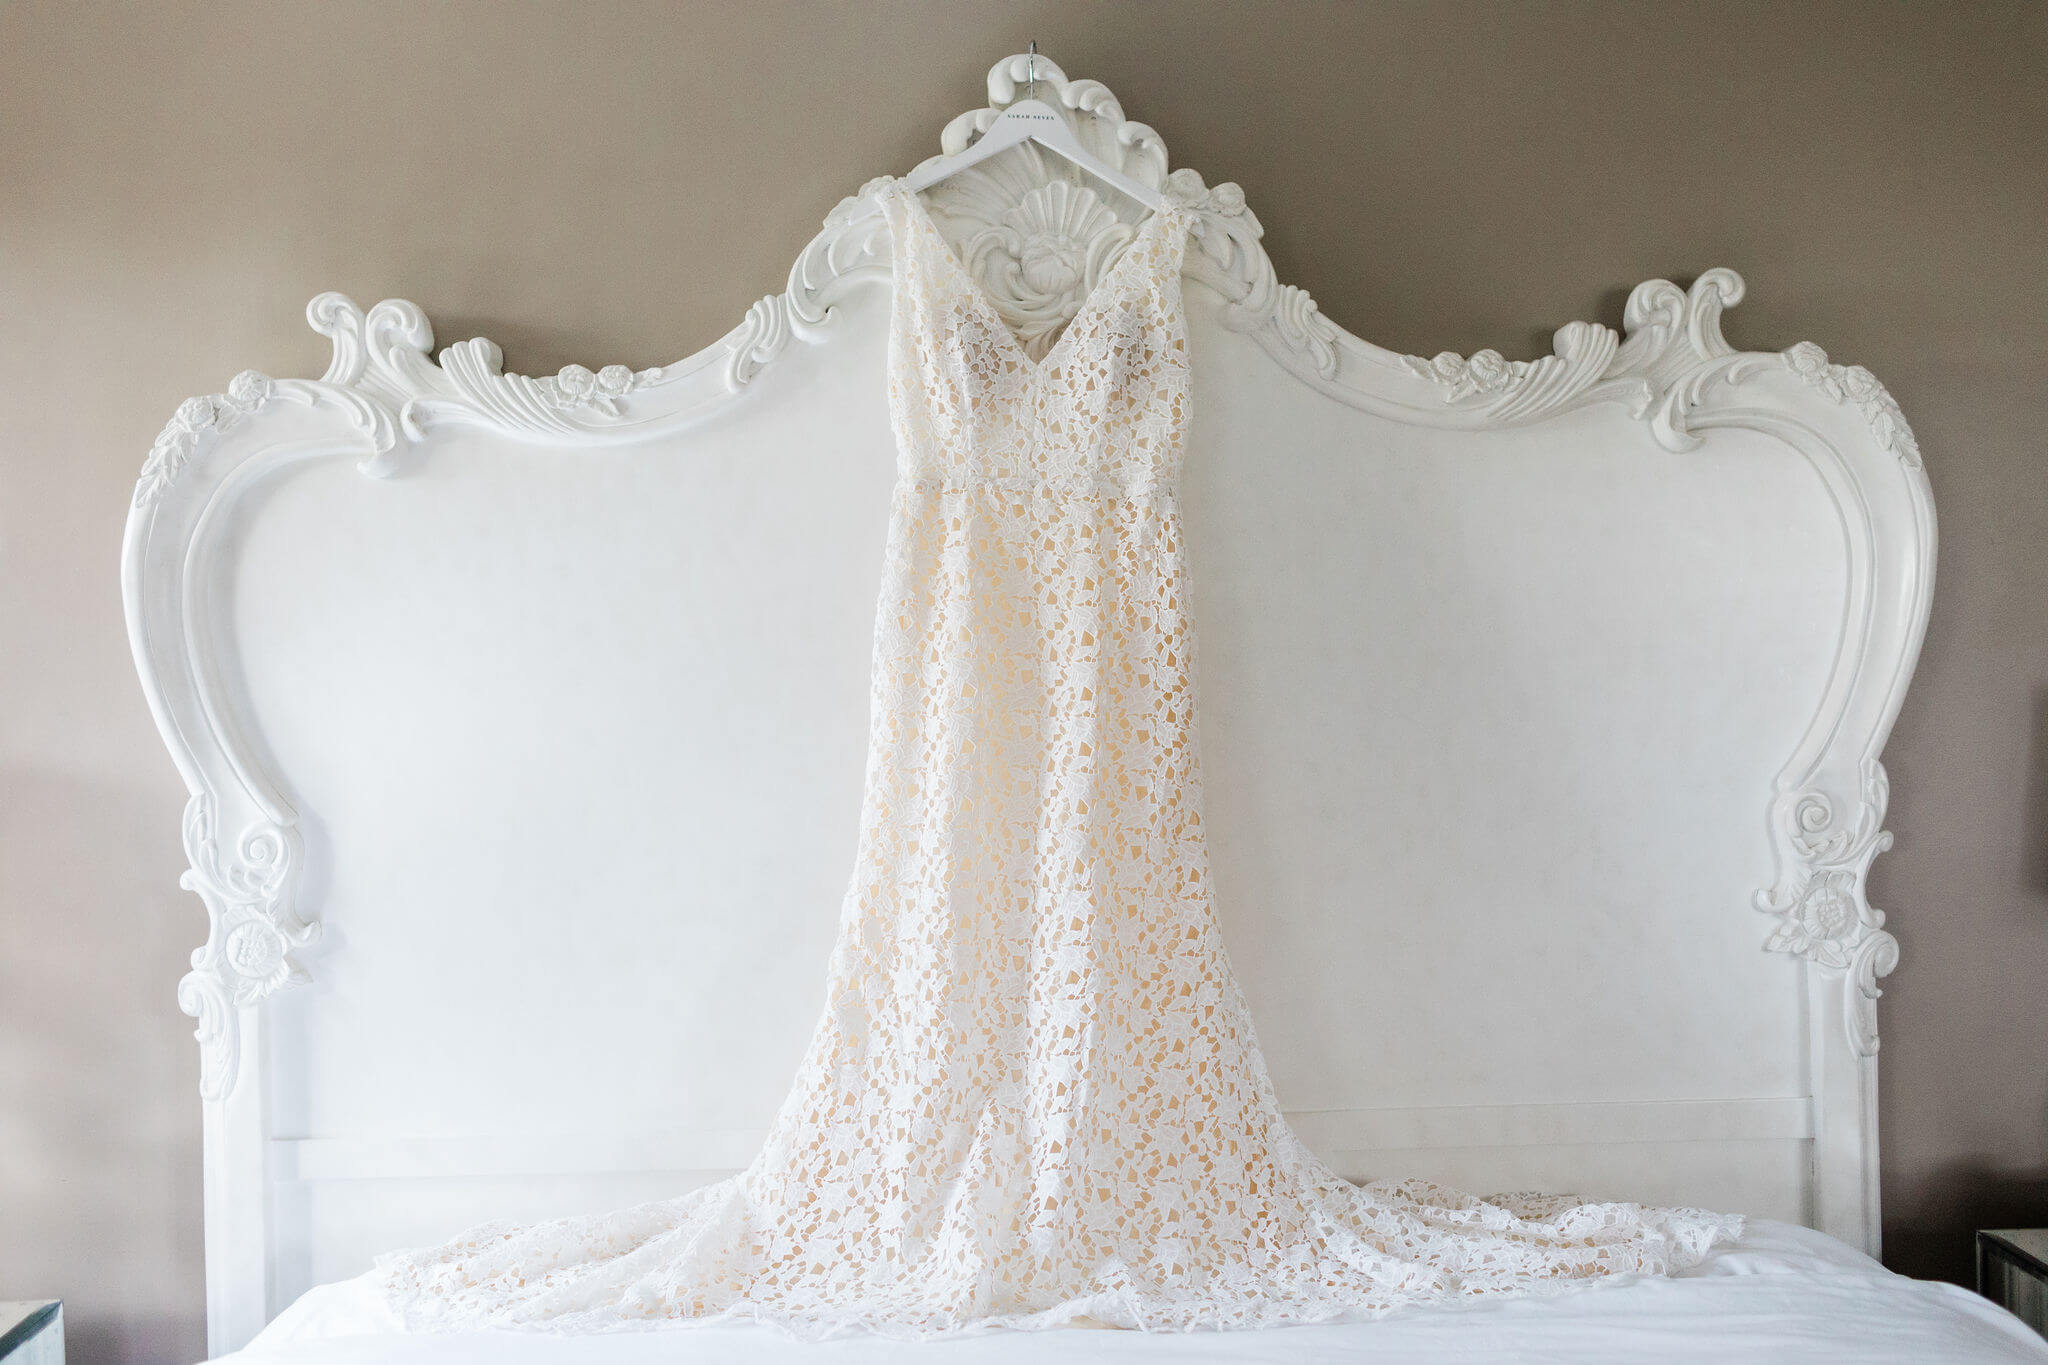 apt-b-photography-savannah-wedding-photographer-savannah-wedding-savannah-elopement-intimate-wedding-photographer-21.JPG